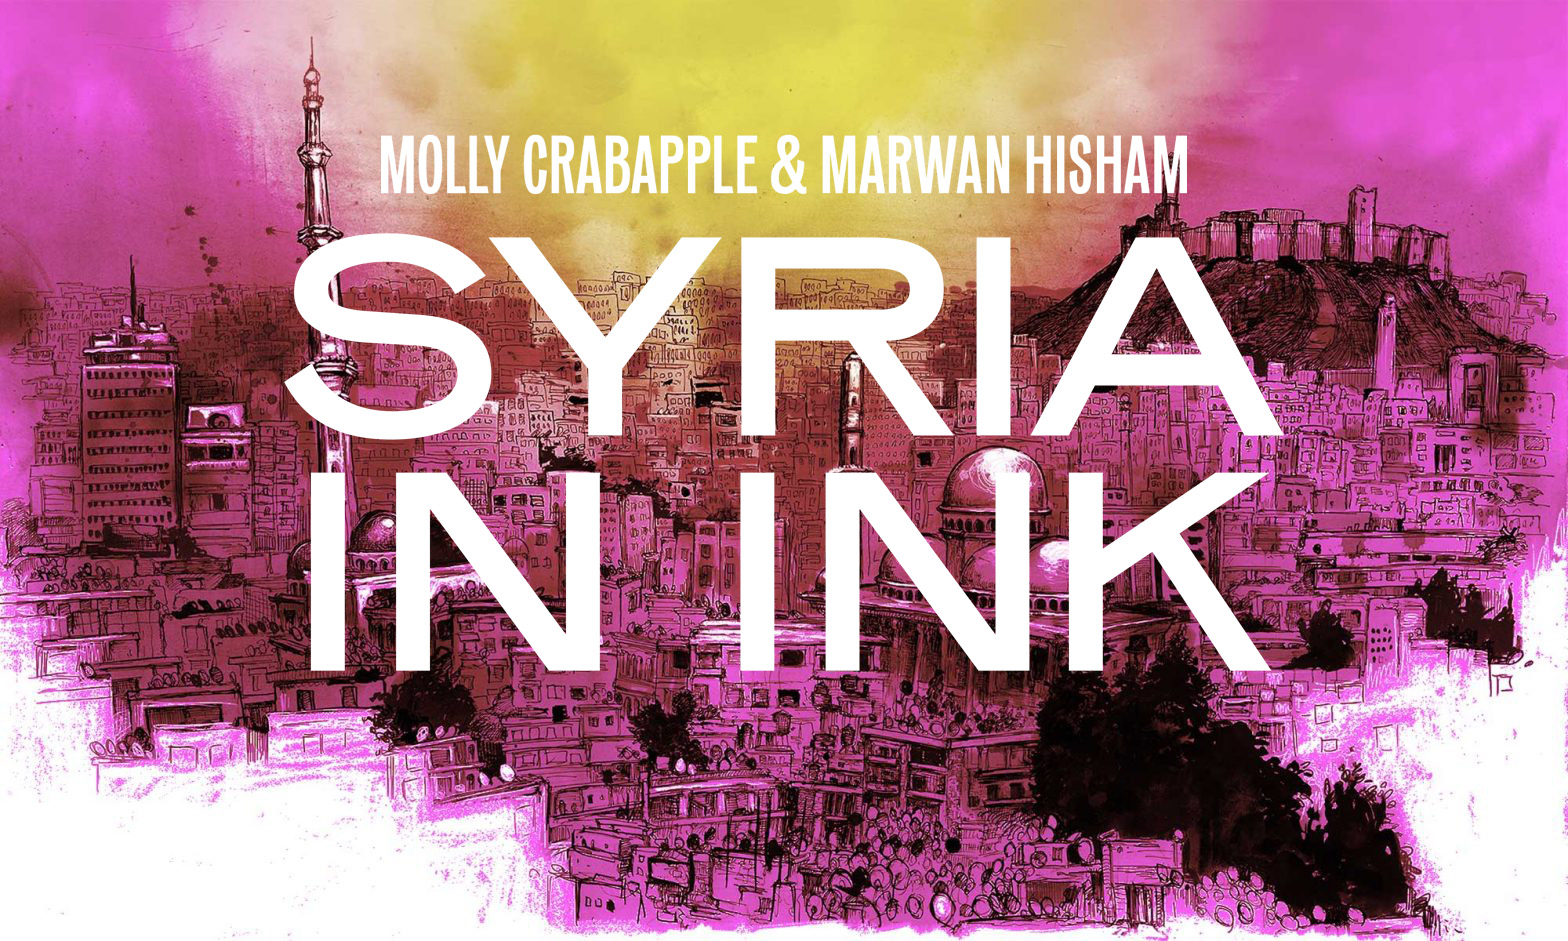 The Art of Molly Crabapple - Molly Crabapple is an award-winning